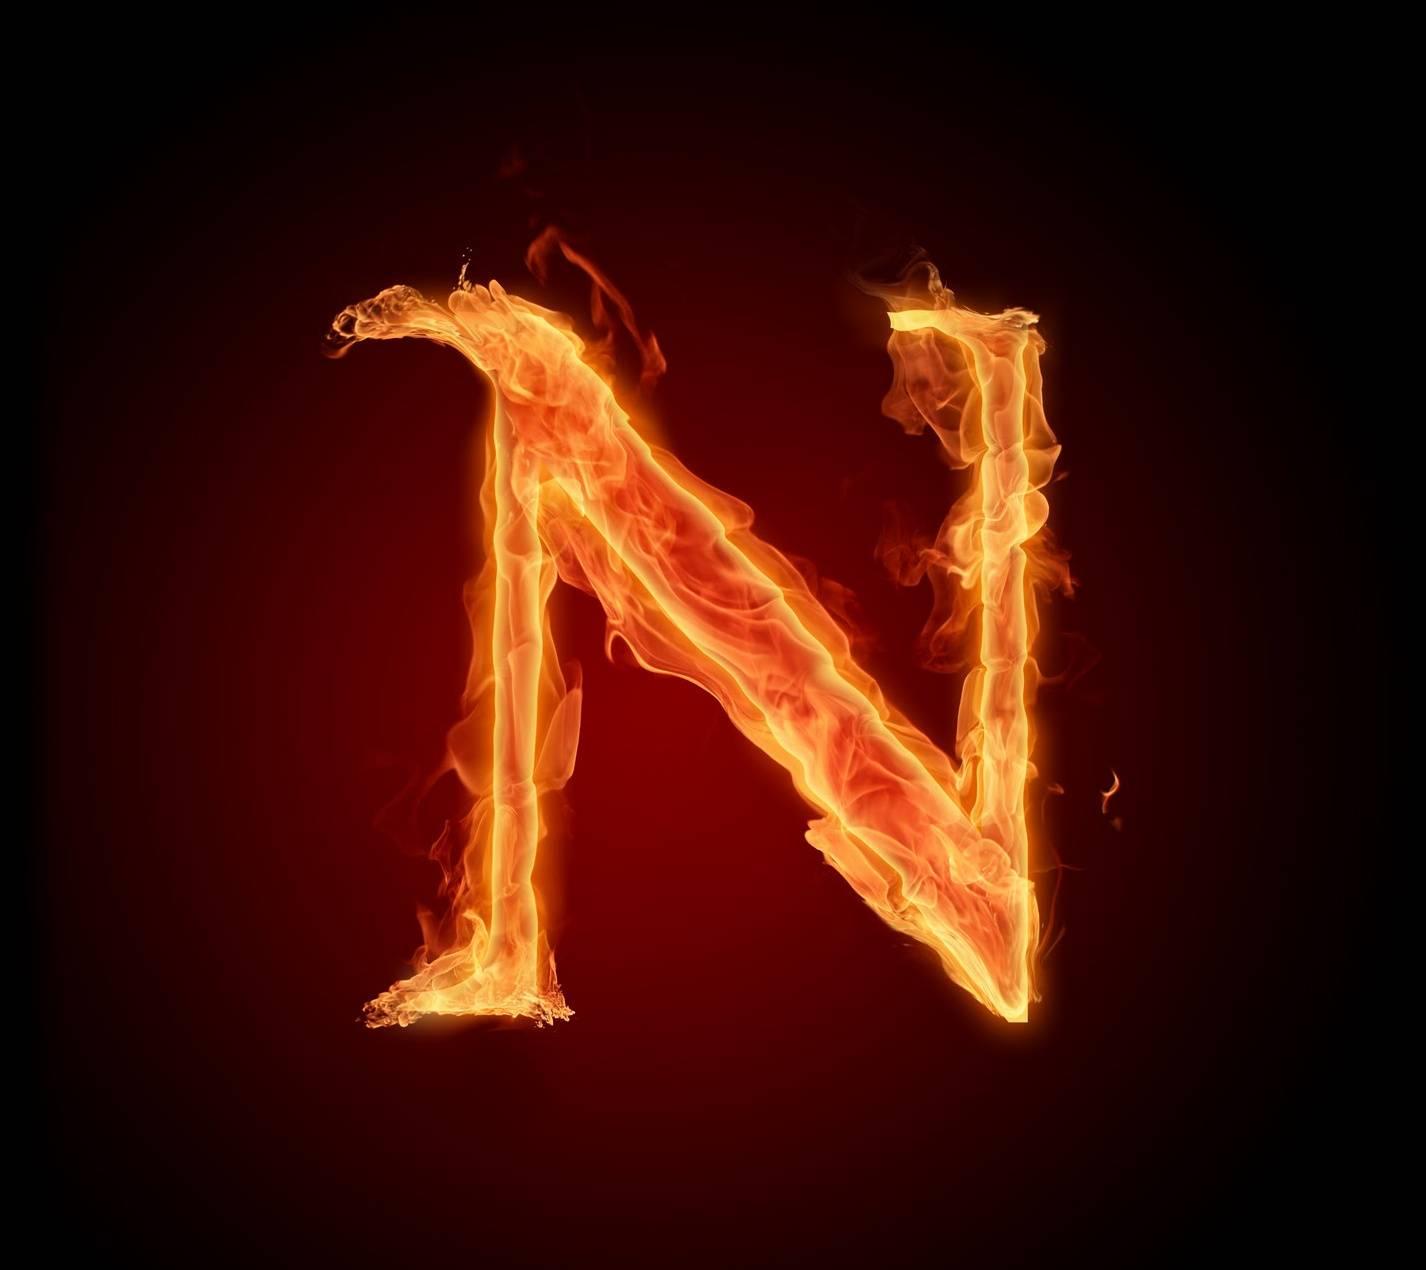 Letter n in fire hd wallpaper by mrlazy 73 free on zedge letter n in fire hd thecheapjerseys Images